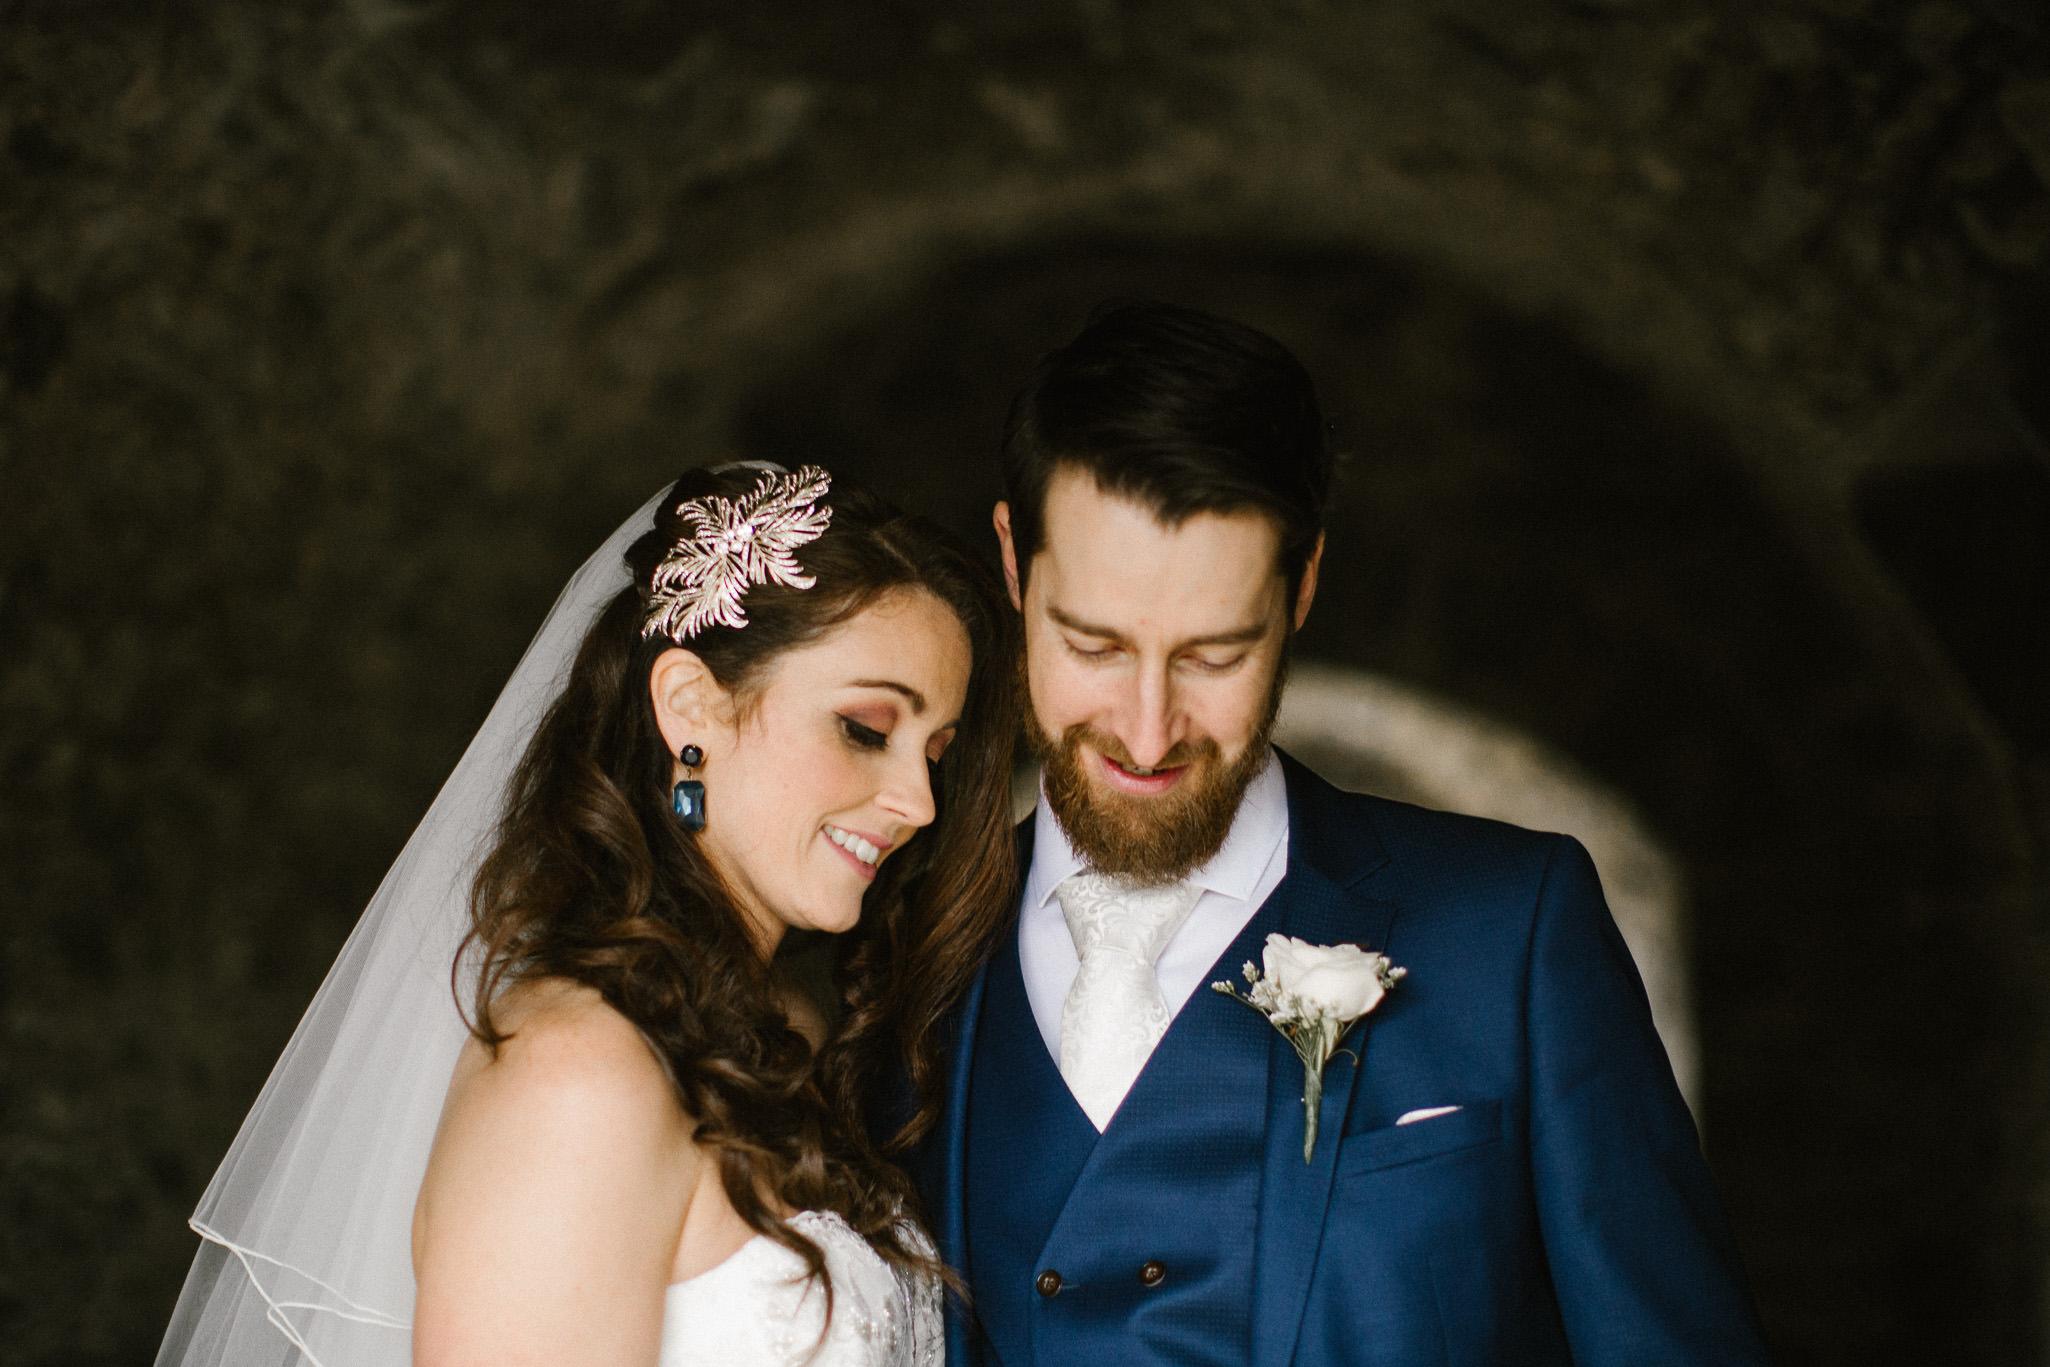 clairebyrnephotography-wedding-night-sparklers-new-years-eve-denyce-leonard-16.jpg